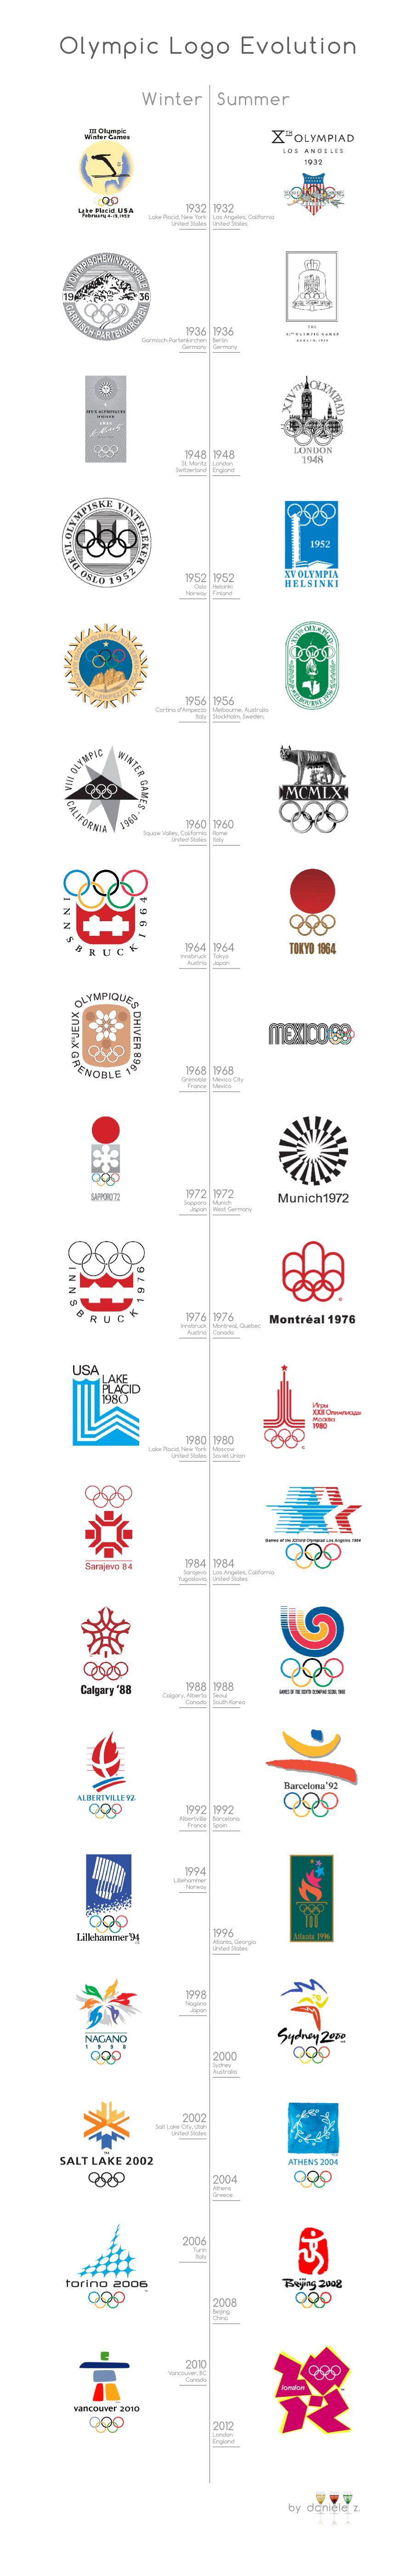 Olympic Logo Evolution - amazing look back!